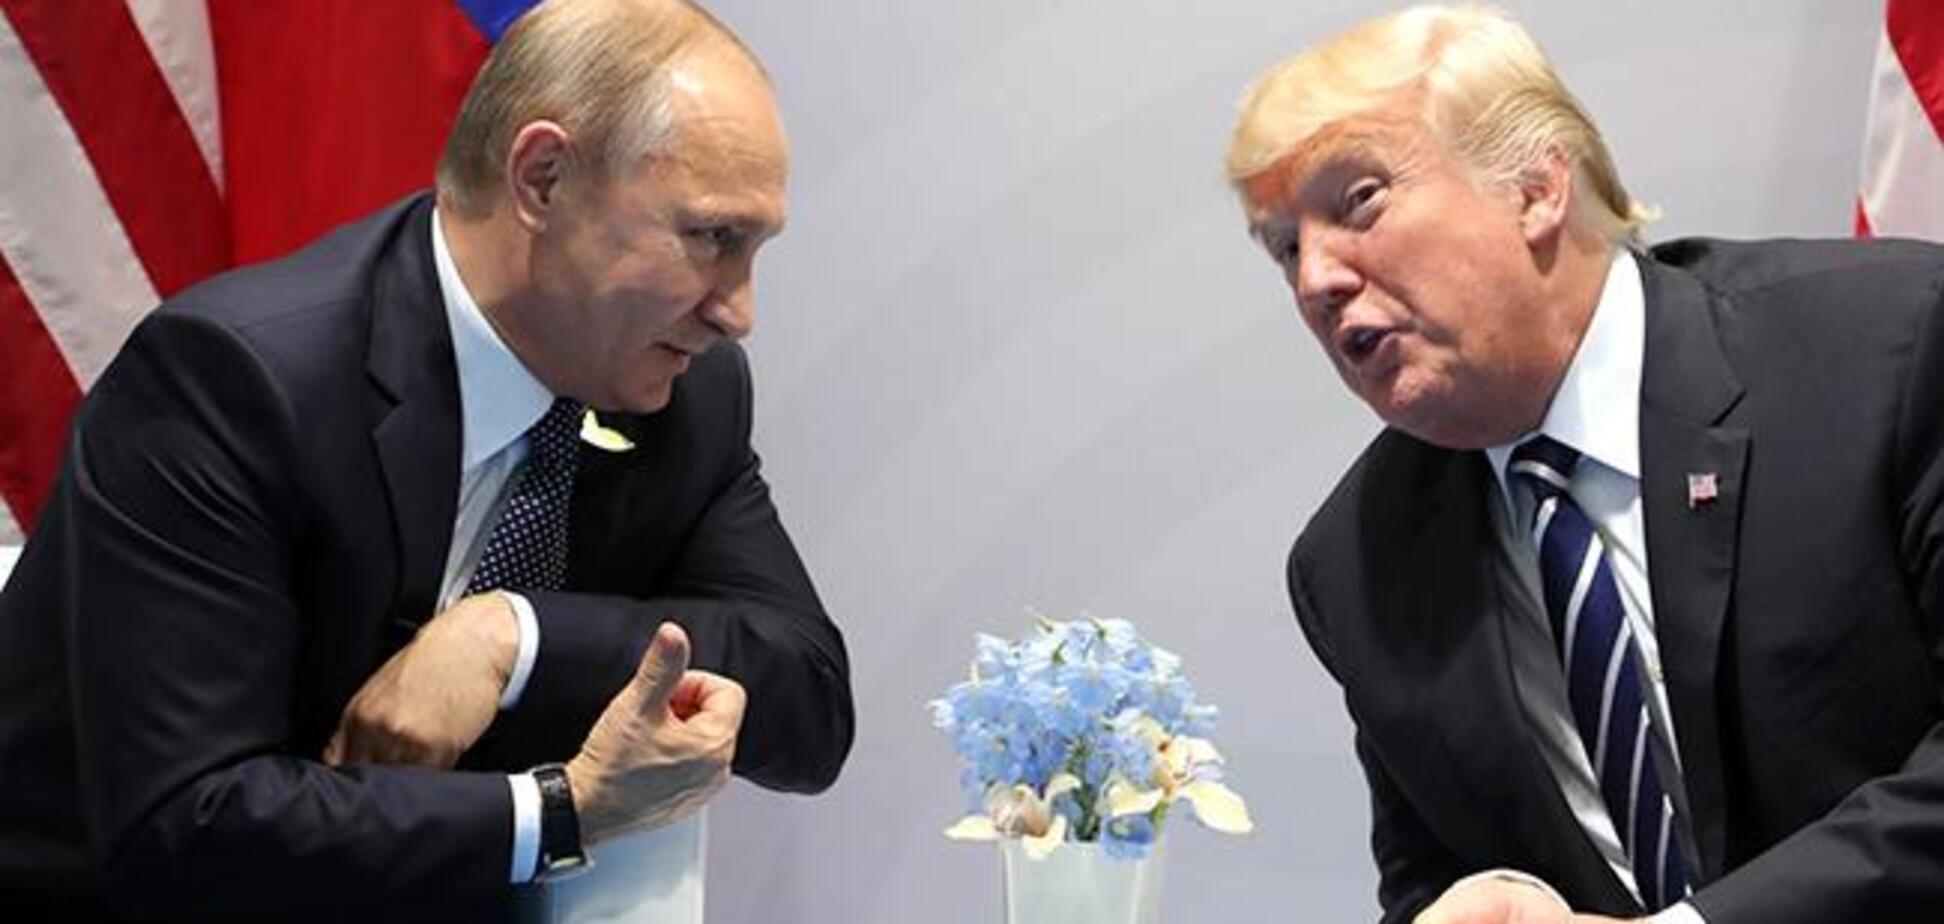 Путин сделал шаг навстречу Украине